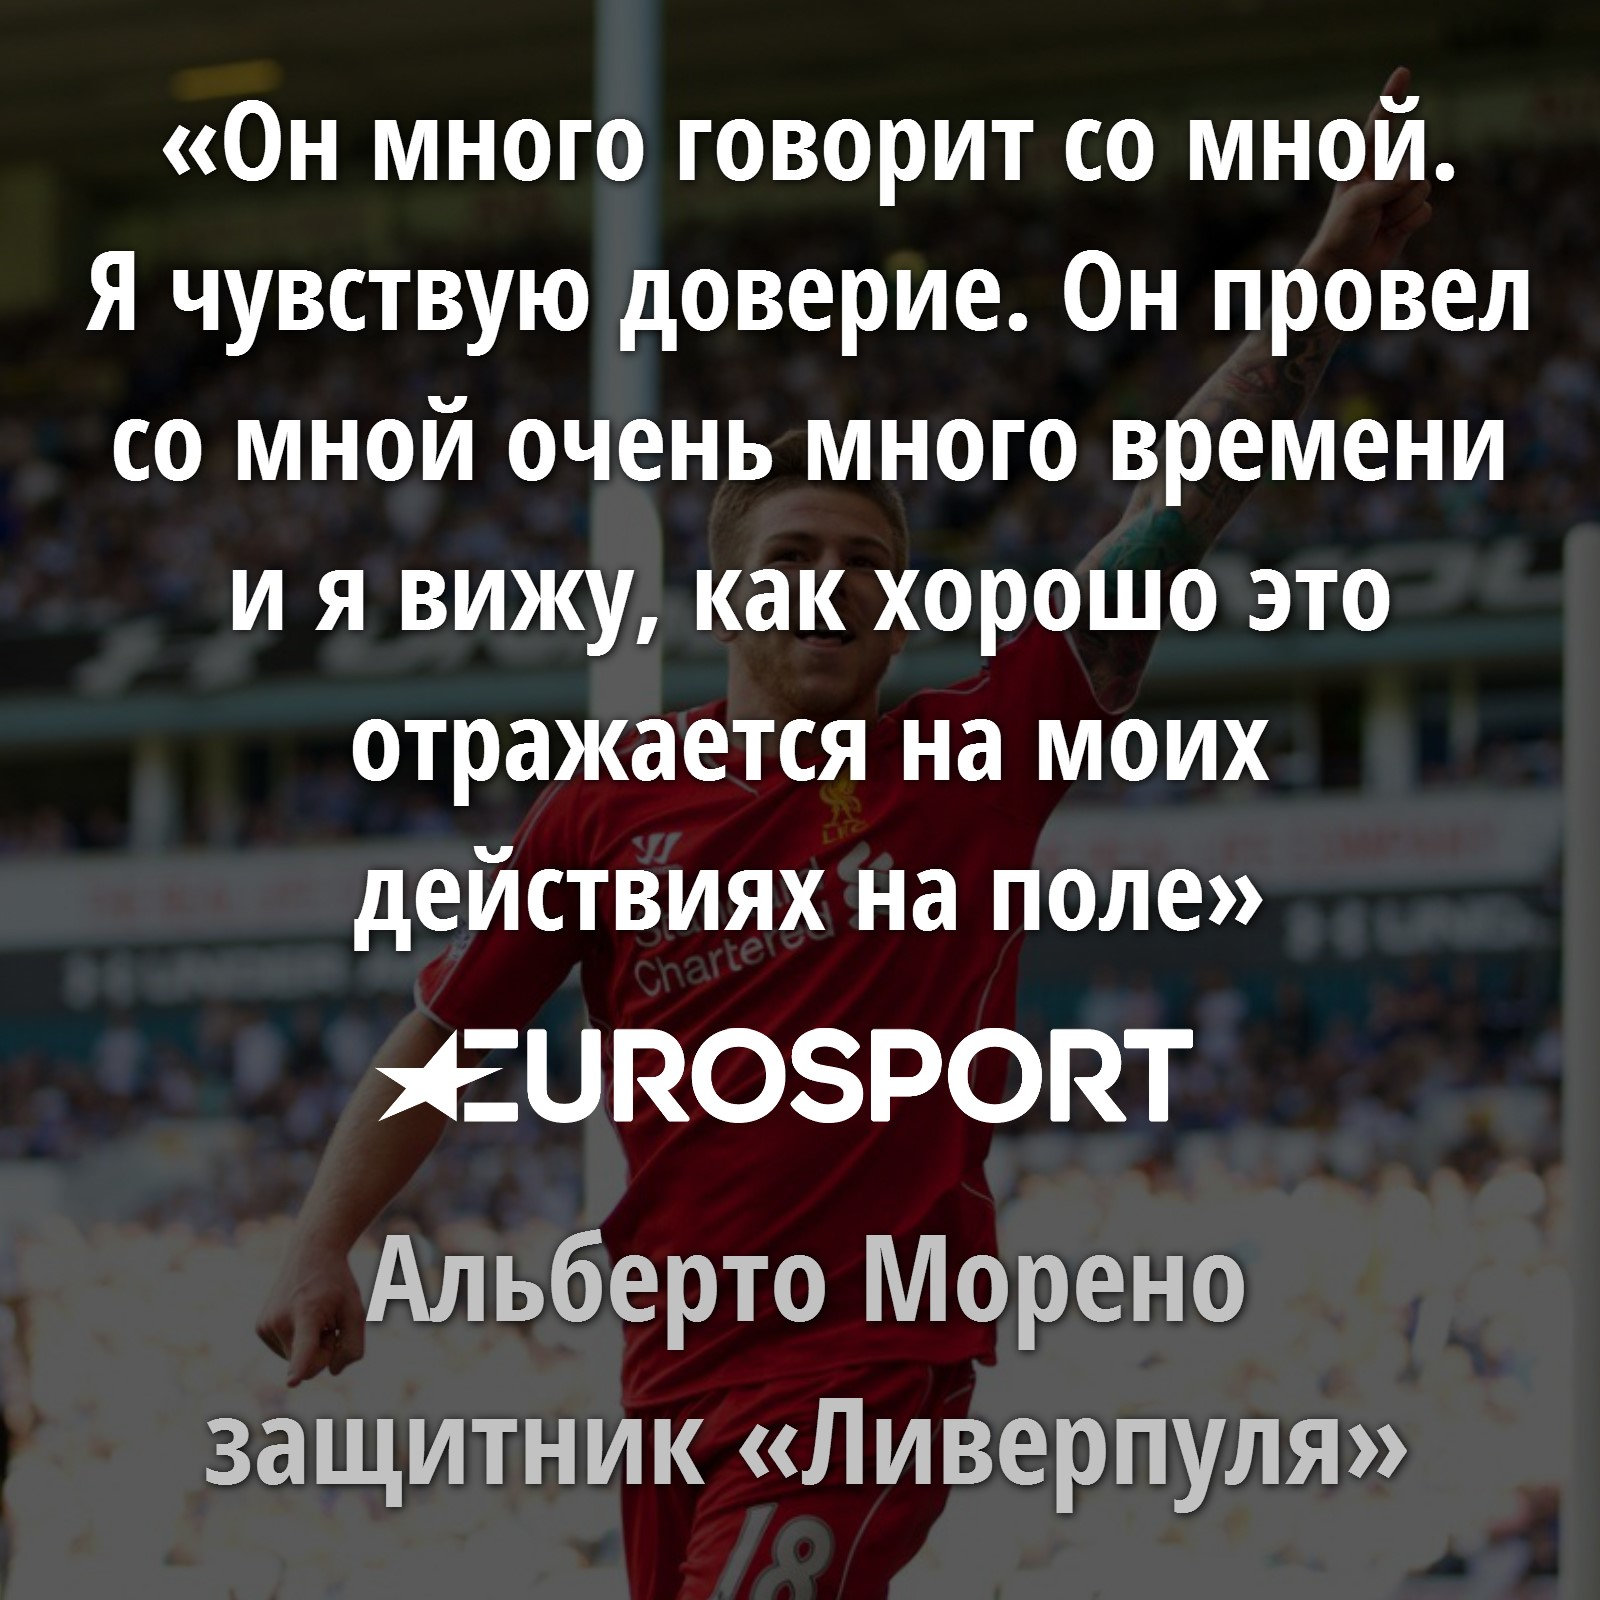 https://i.eurosport.com/2015/11/19/1735234.jpg